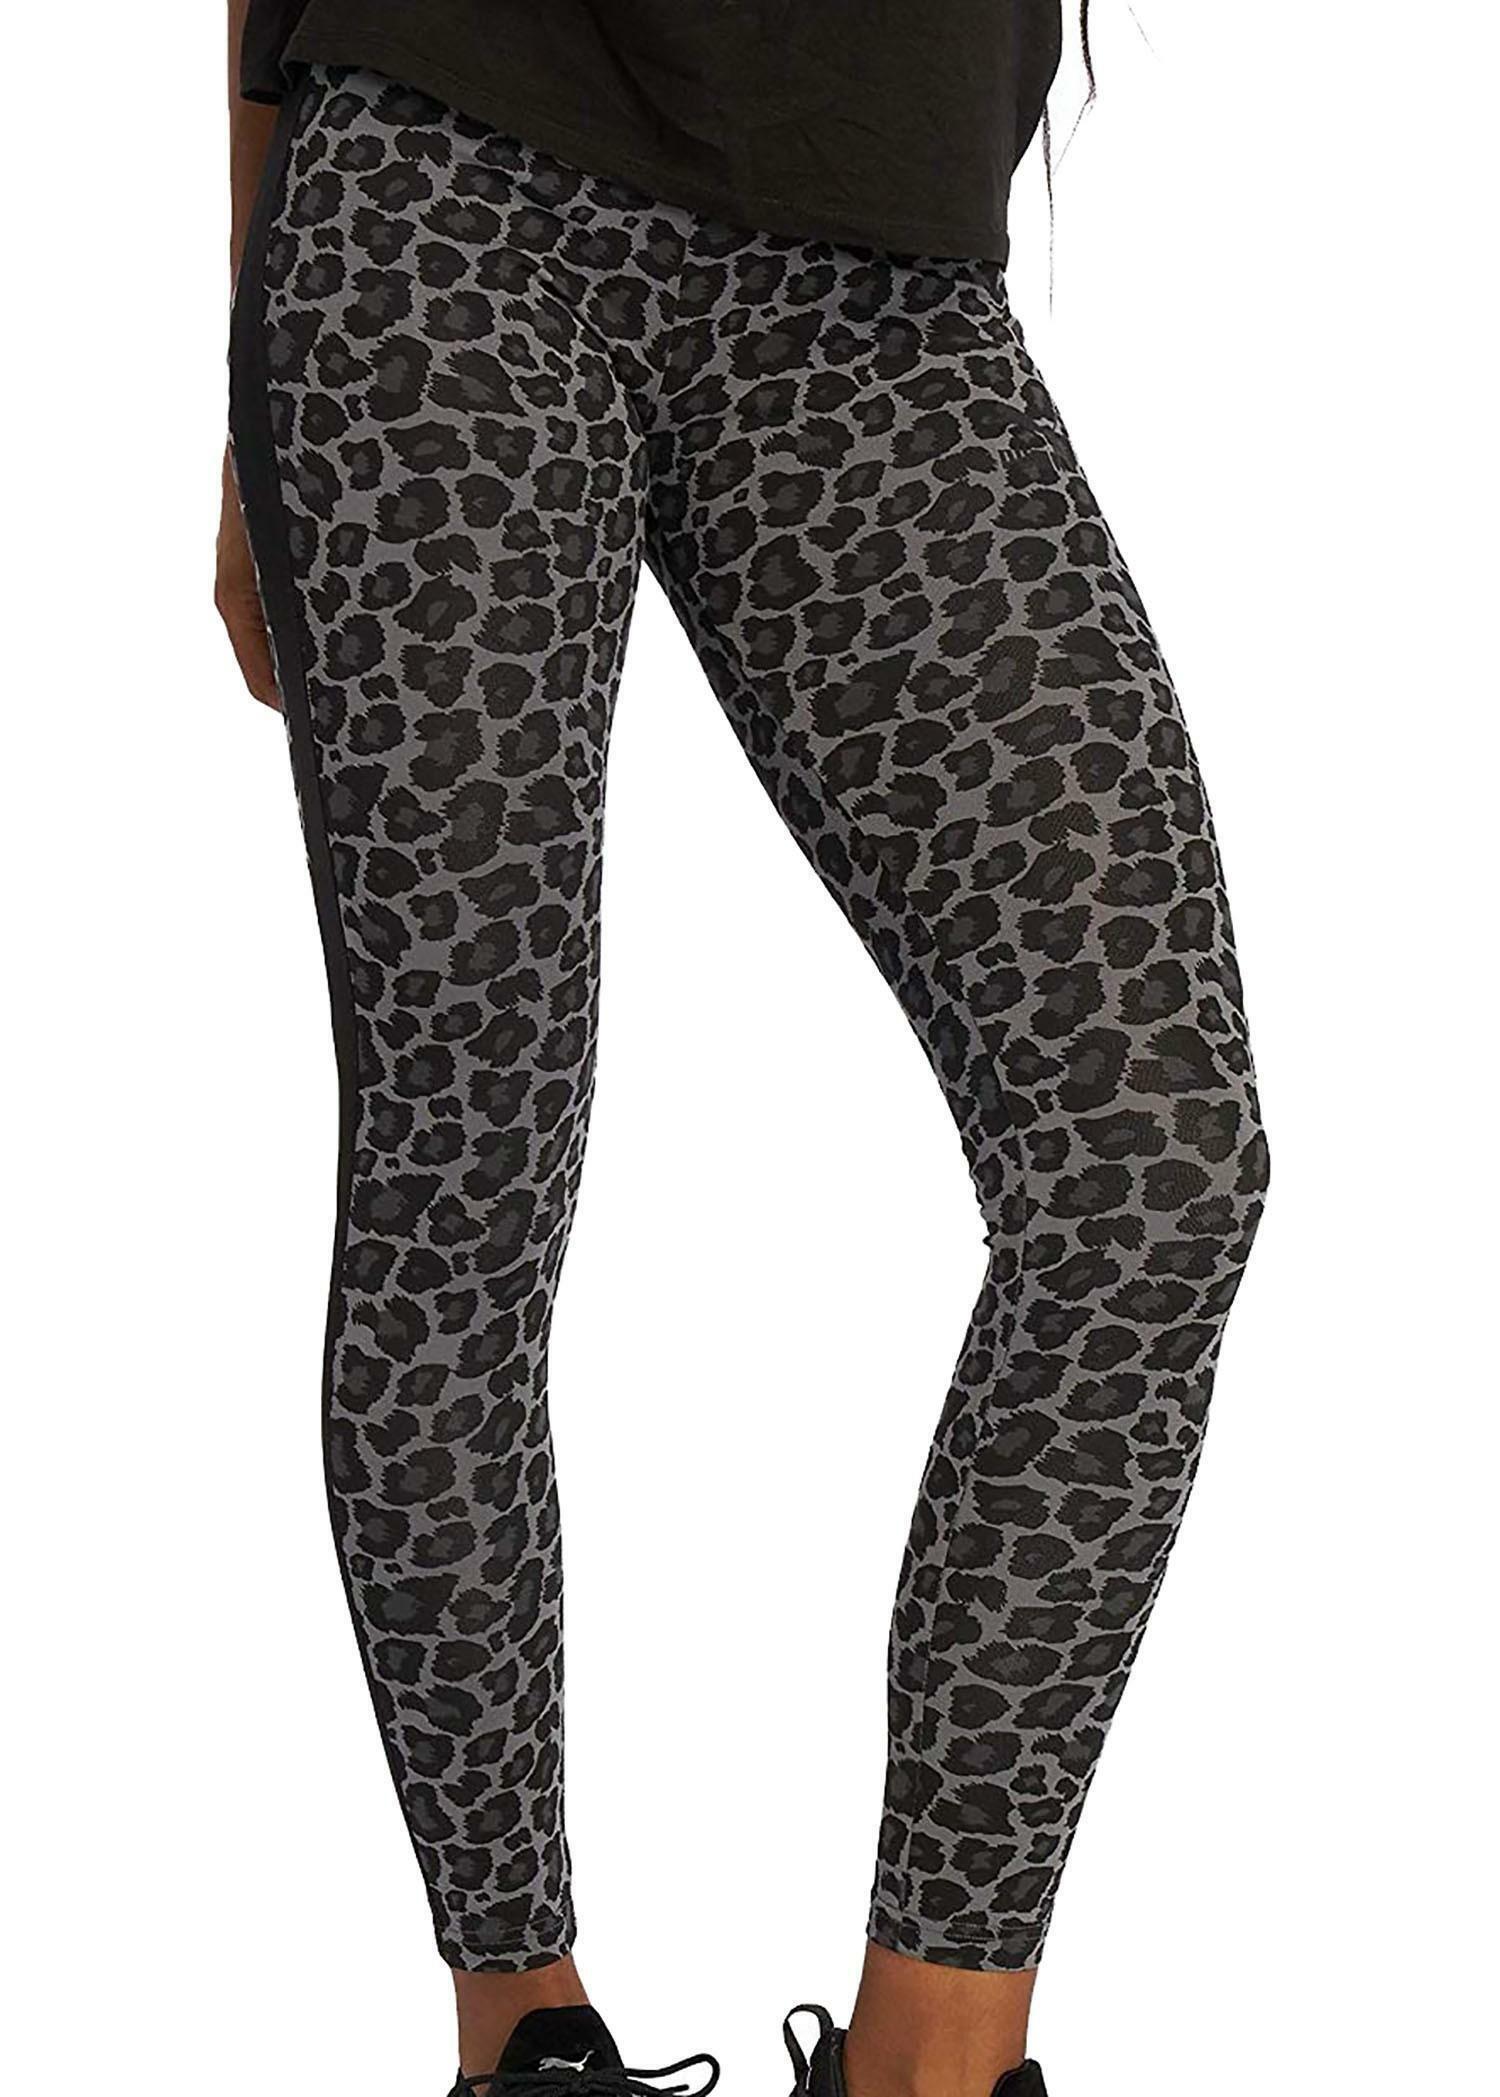 buy online 374a0 797a0 Puma wild pack t7 leggings donna grigi 57846780